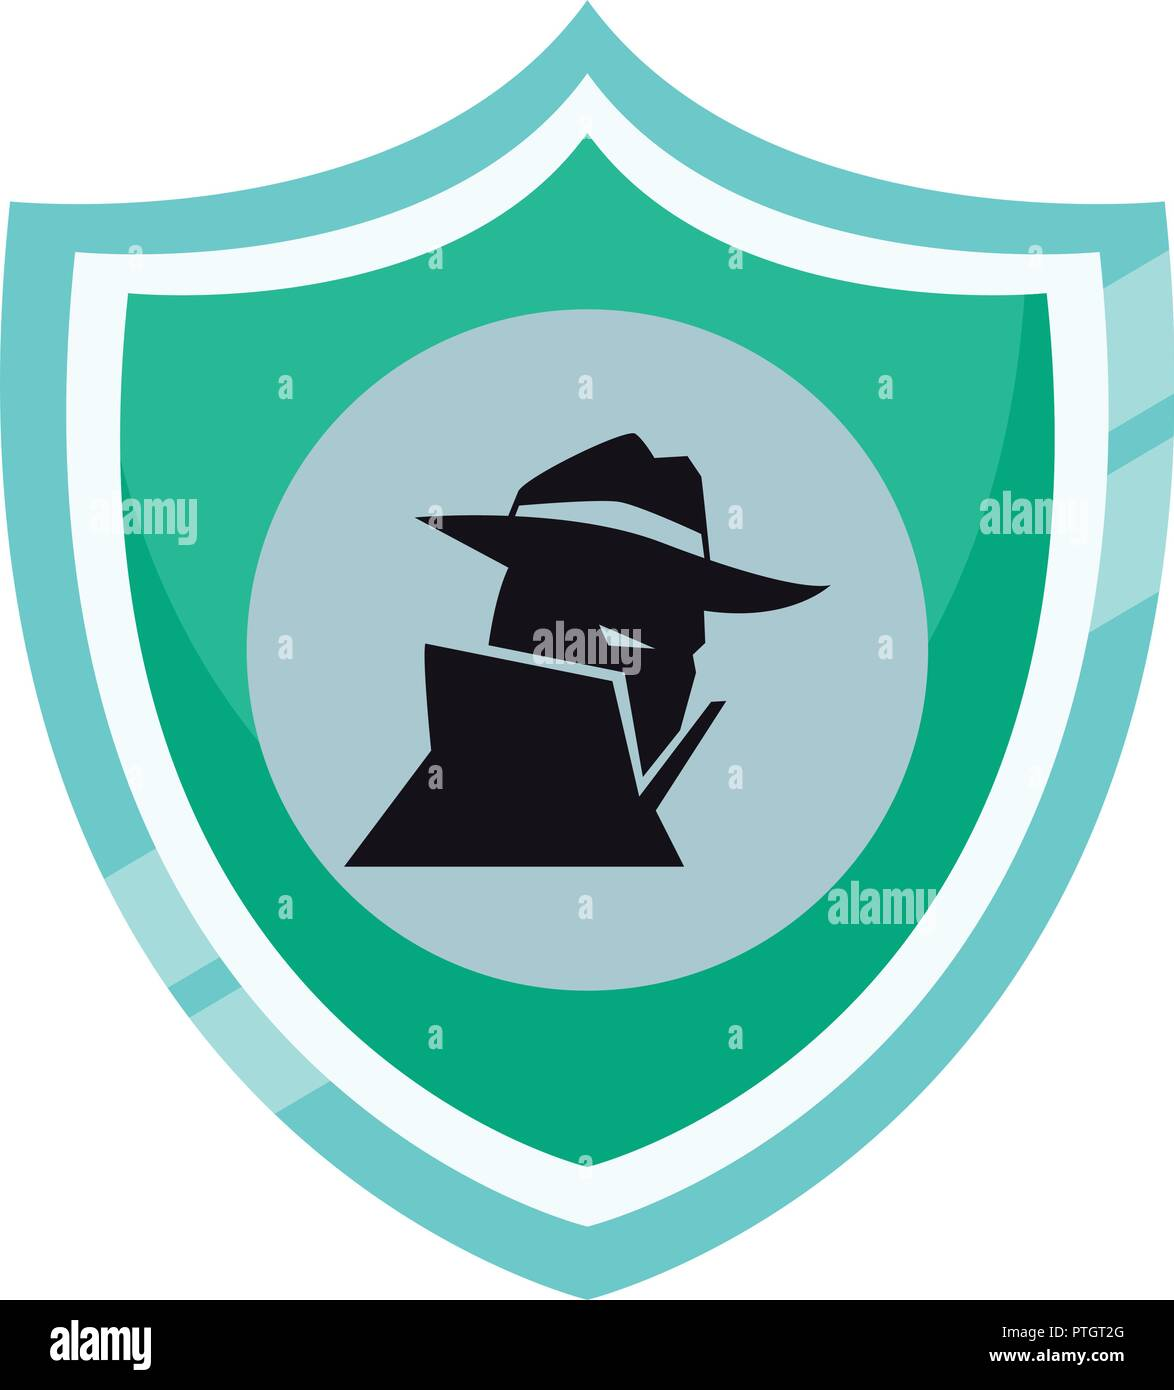 Spyware on shield - Stock Image